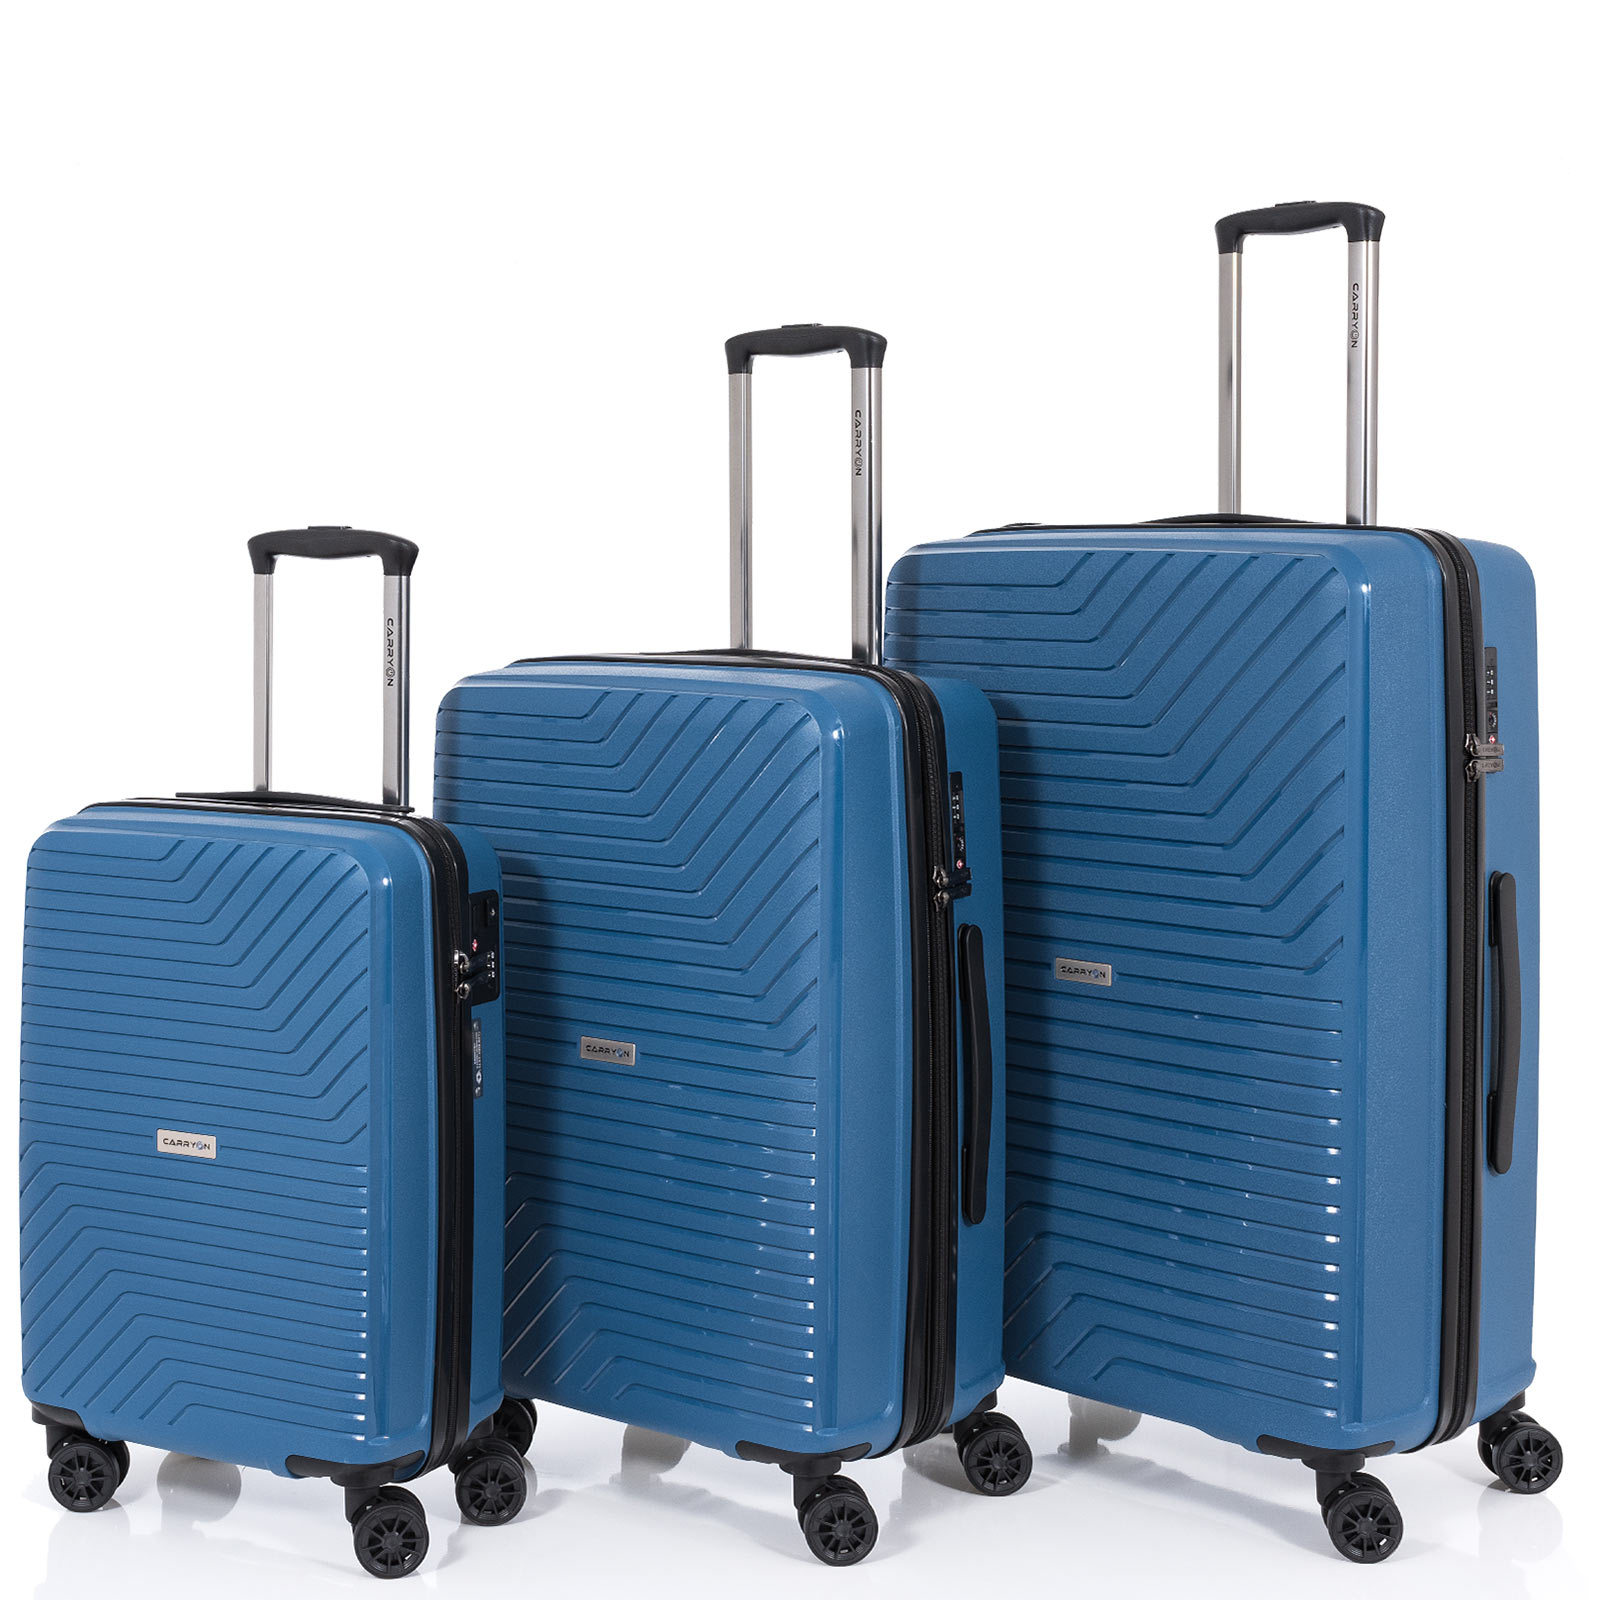 carryon-transport-3-tlg-hartschalen-koffer-set-blau